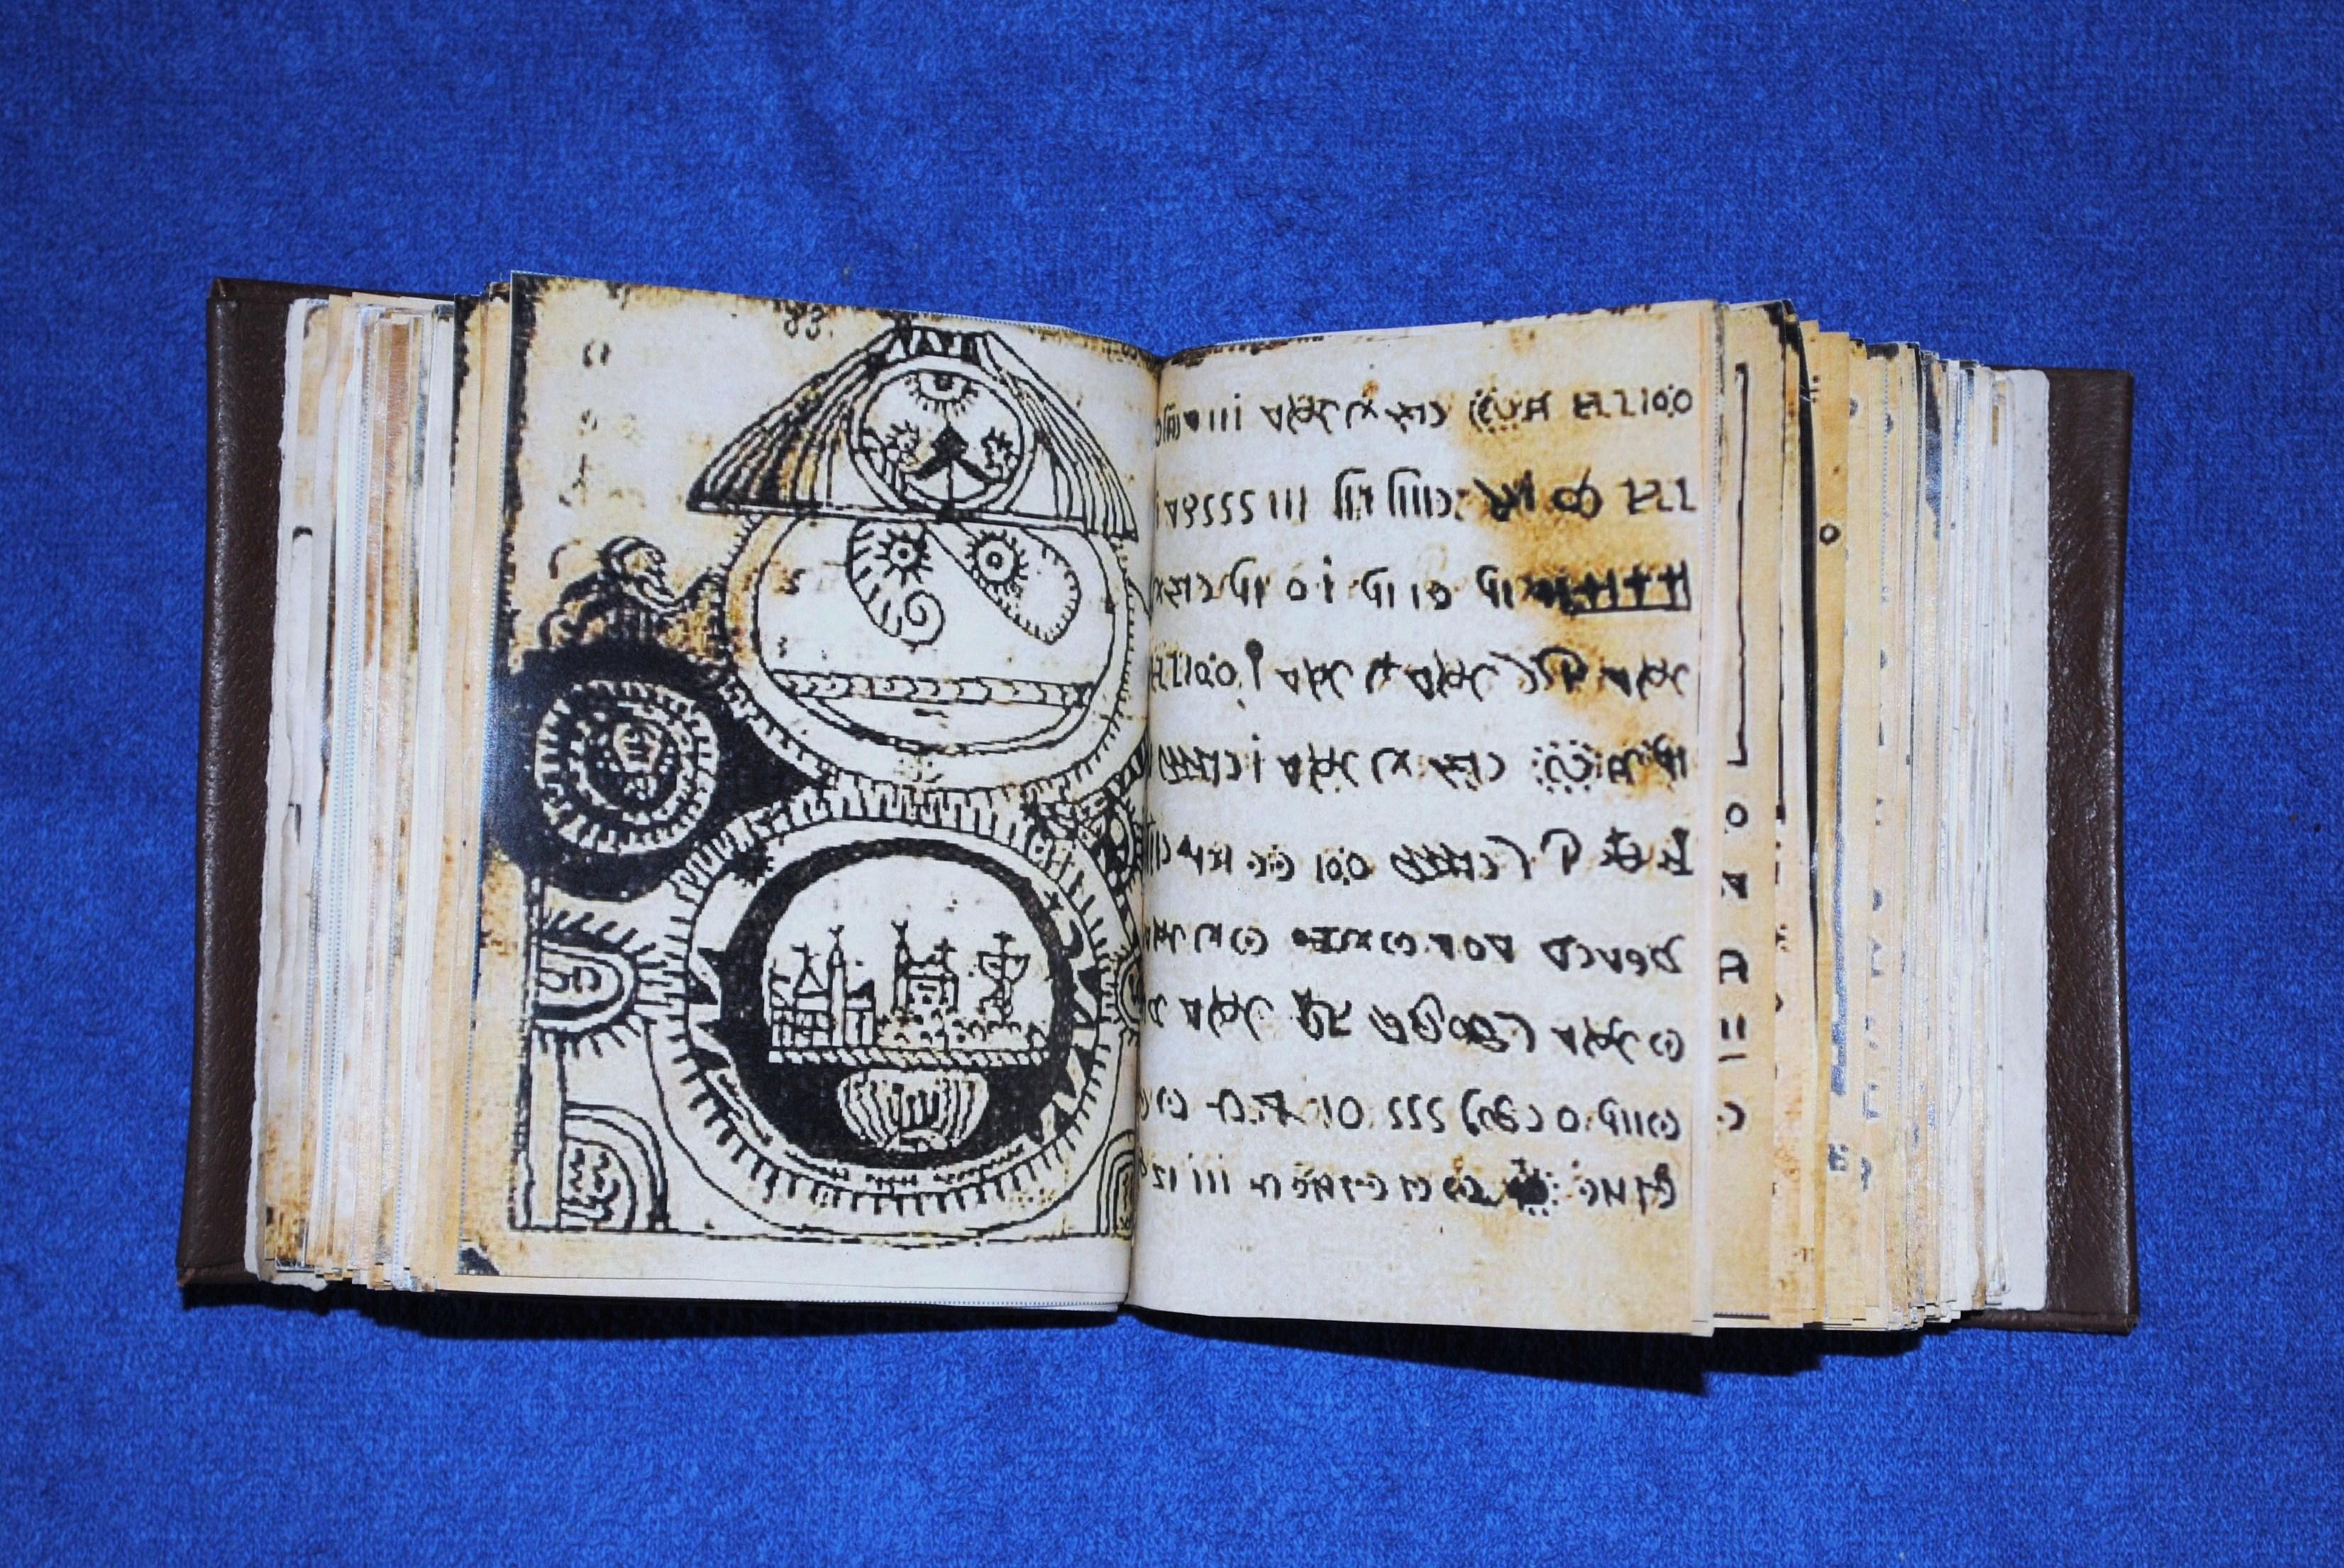 codex-rohonci-copy.jpg